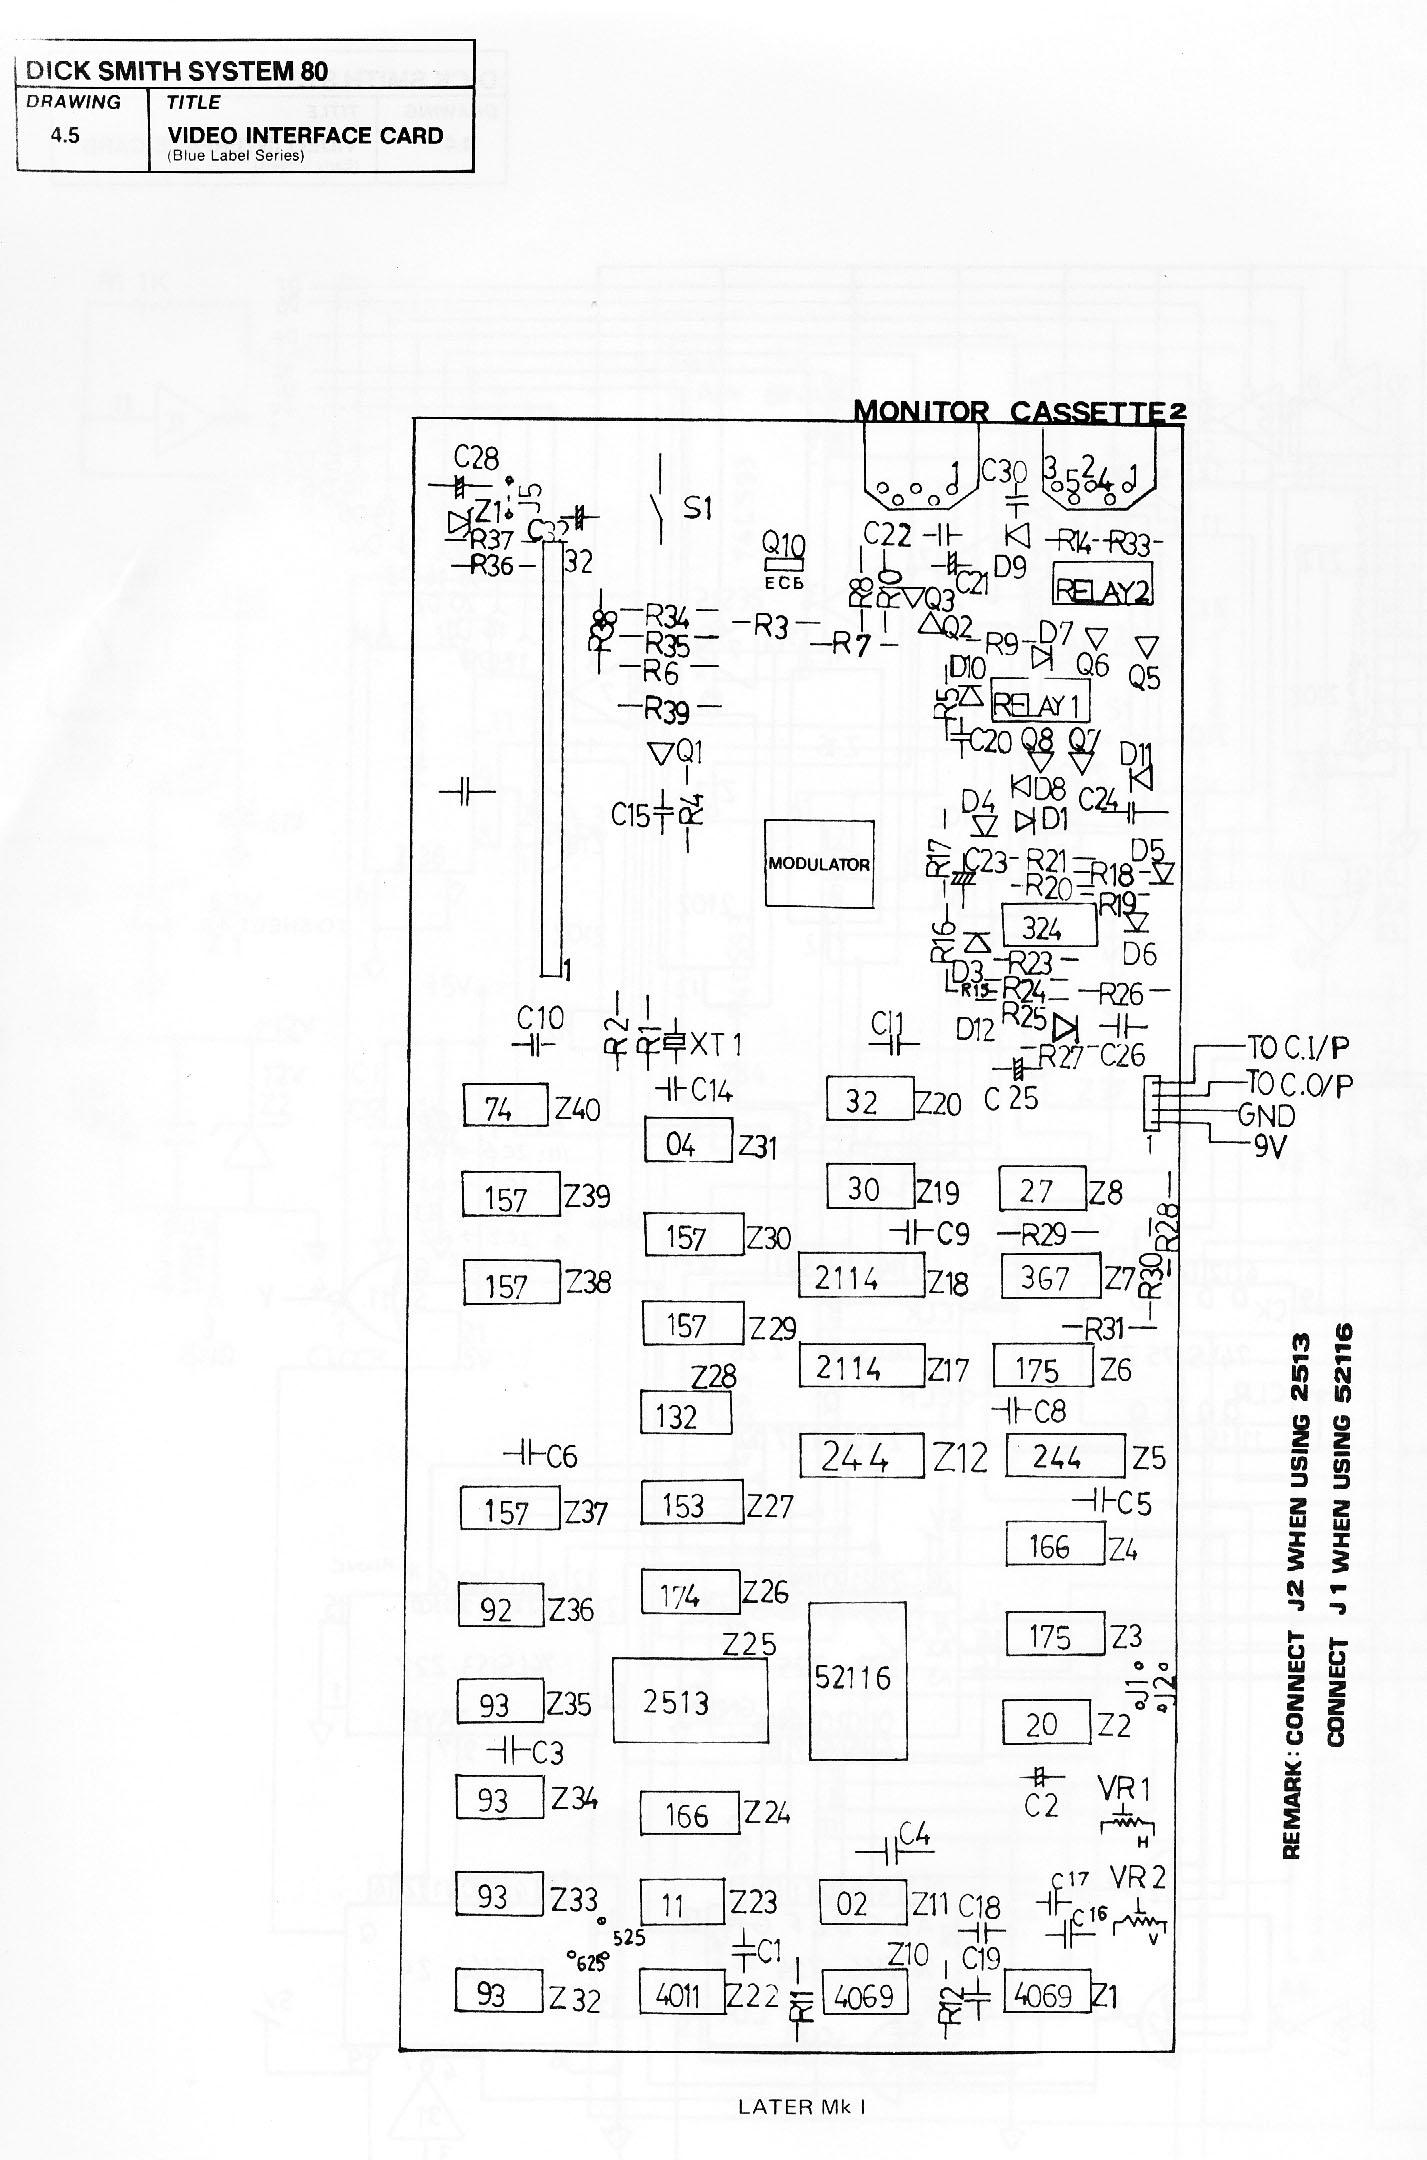 system 80 manuals